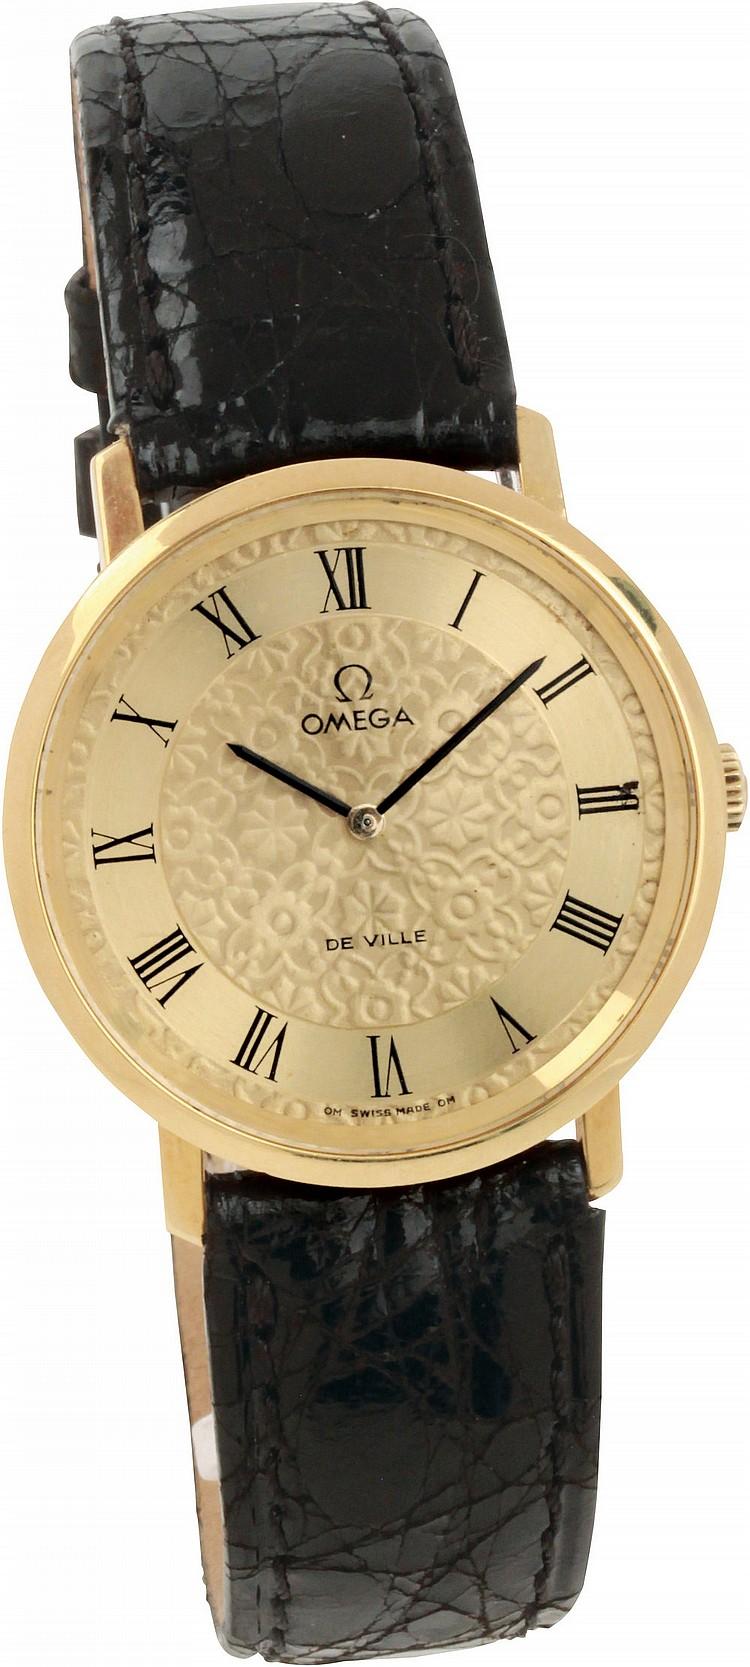 Omega DeVille ref. 111 107, '70s